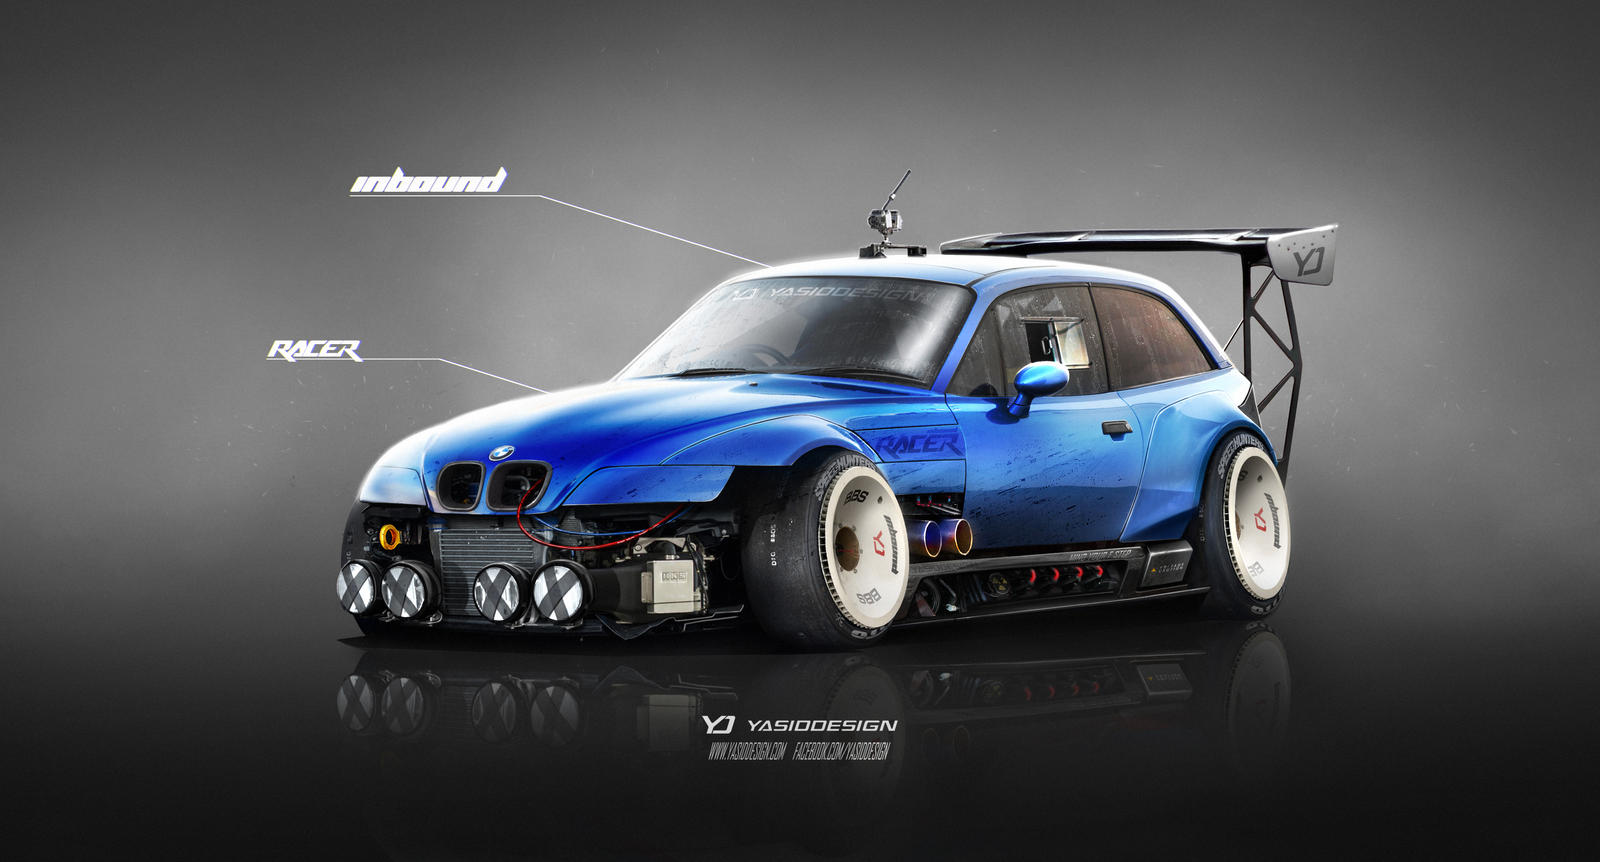 Best Body Design For Pinewood Derby Car